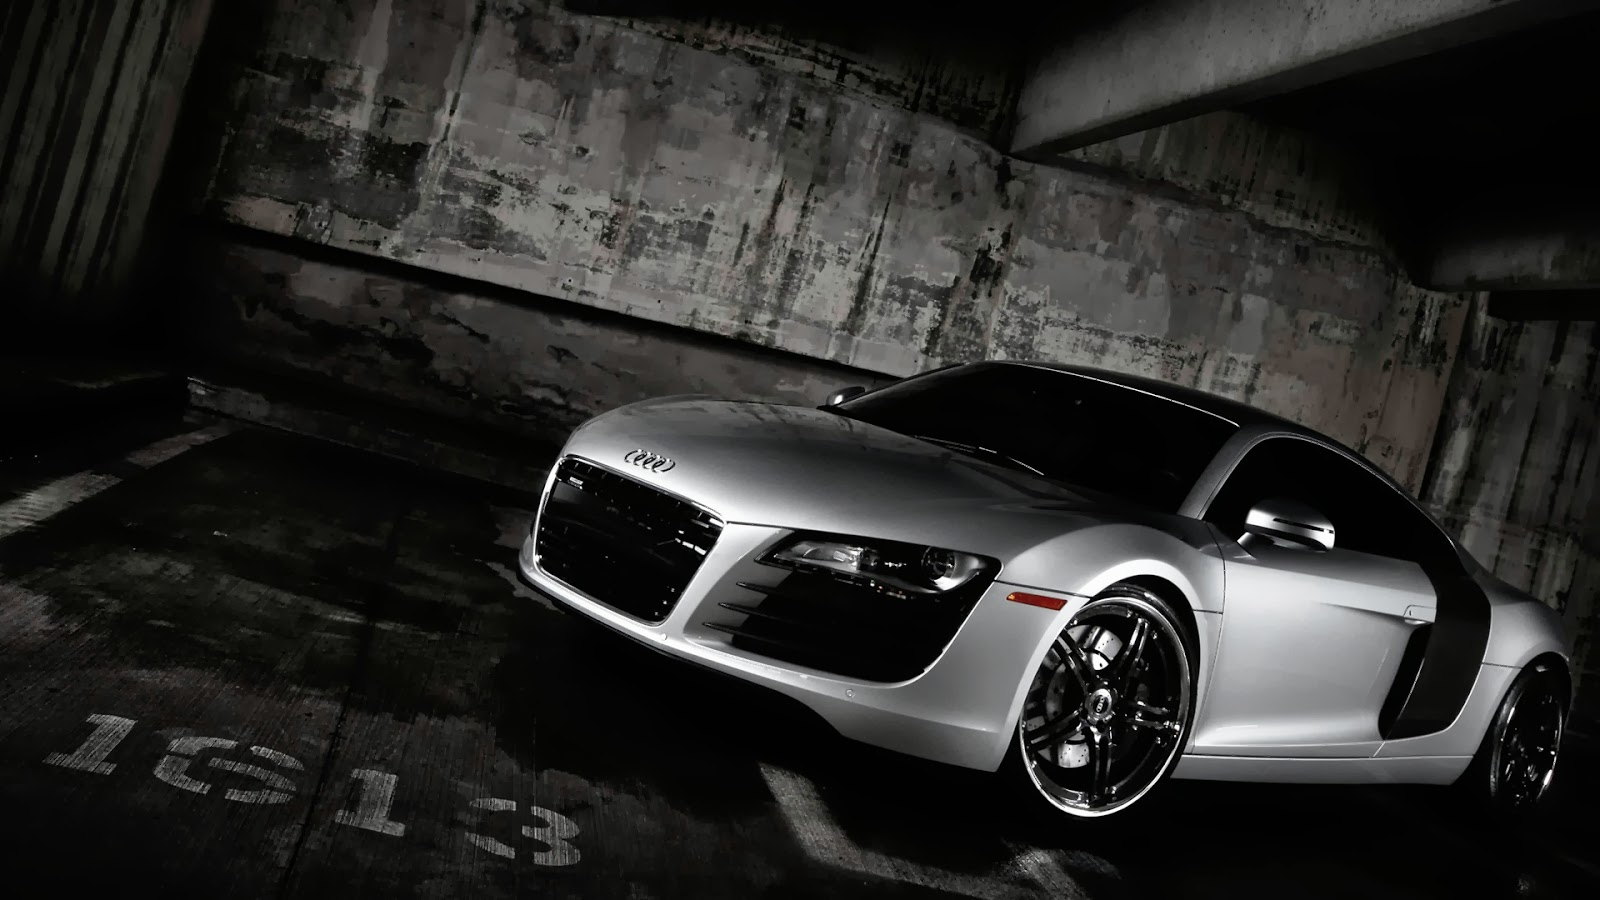 Audi Sports Car Wallpaper سيارات كيمو خلفيات سيارات Hd رائعه Cars Wallpapers